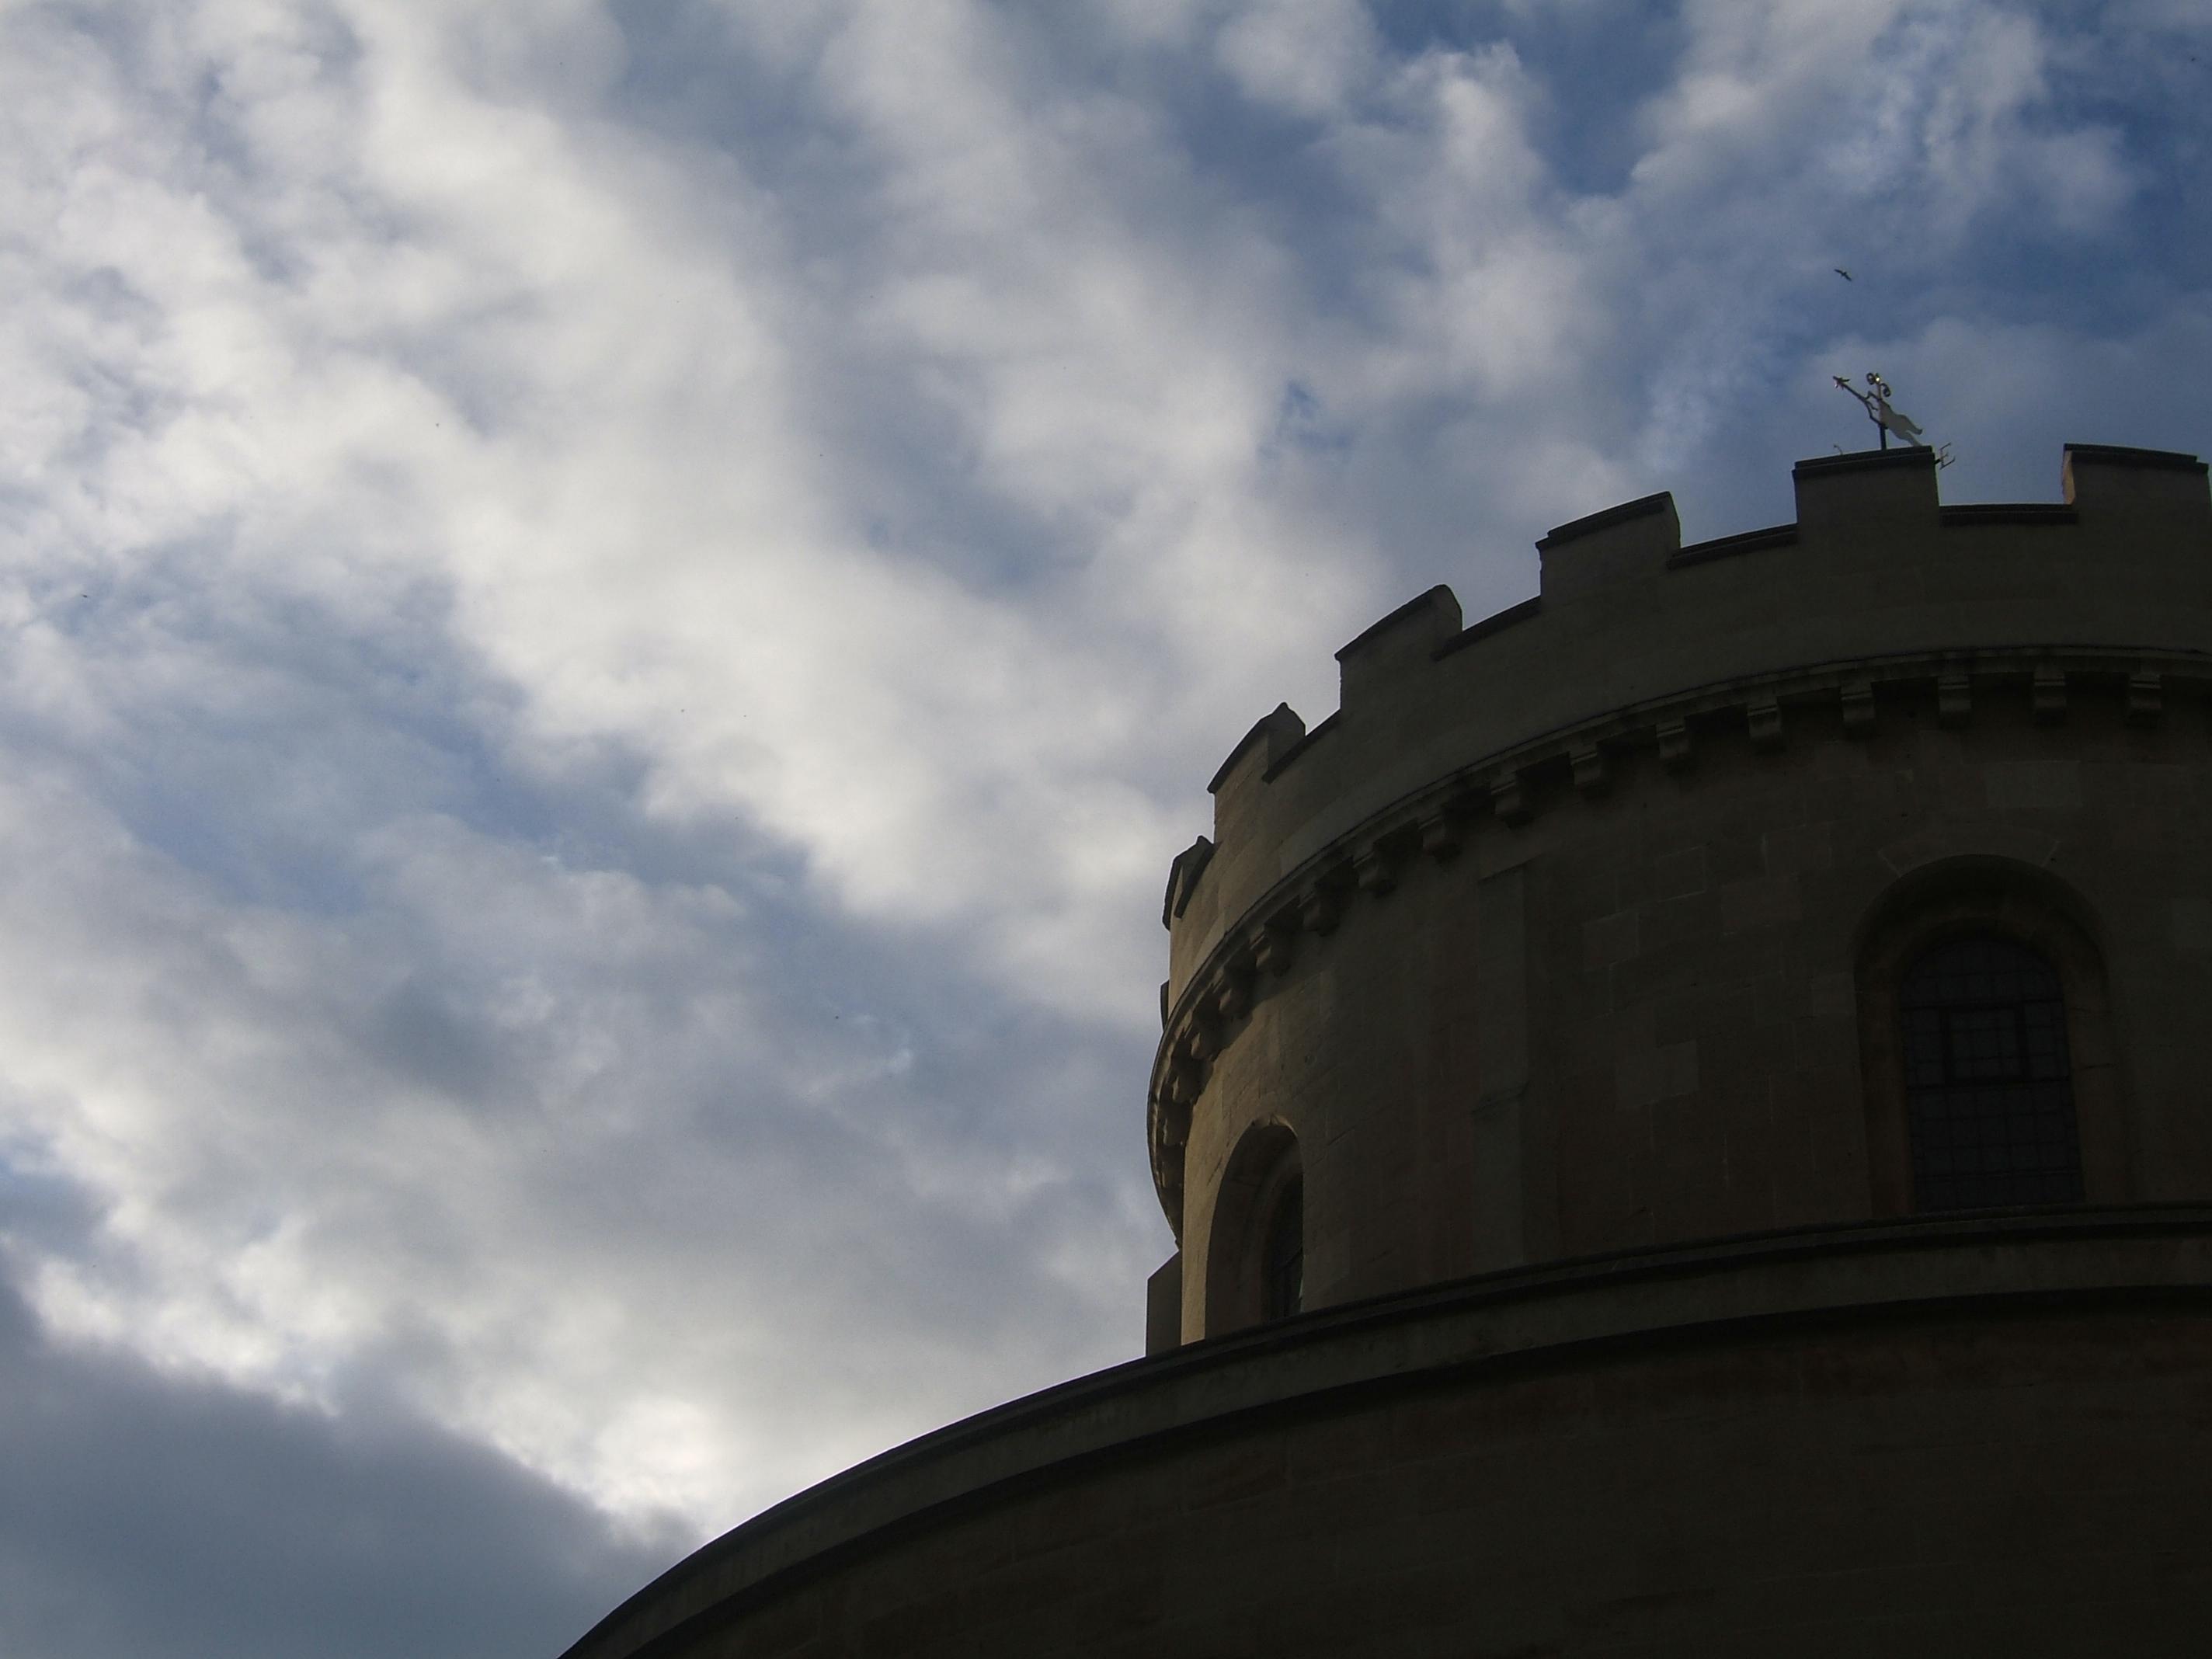 TEmple Church - 15 minutes in Fleet Street